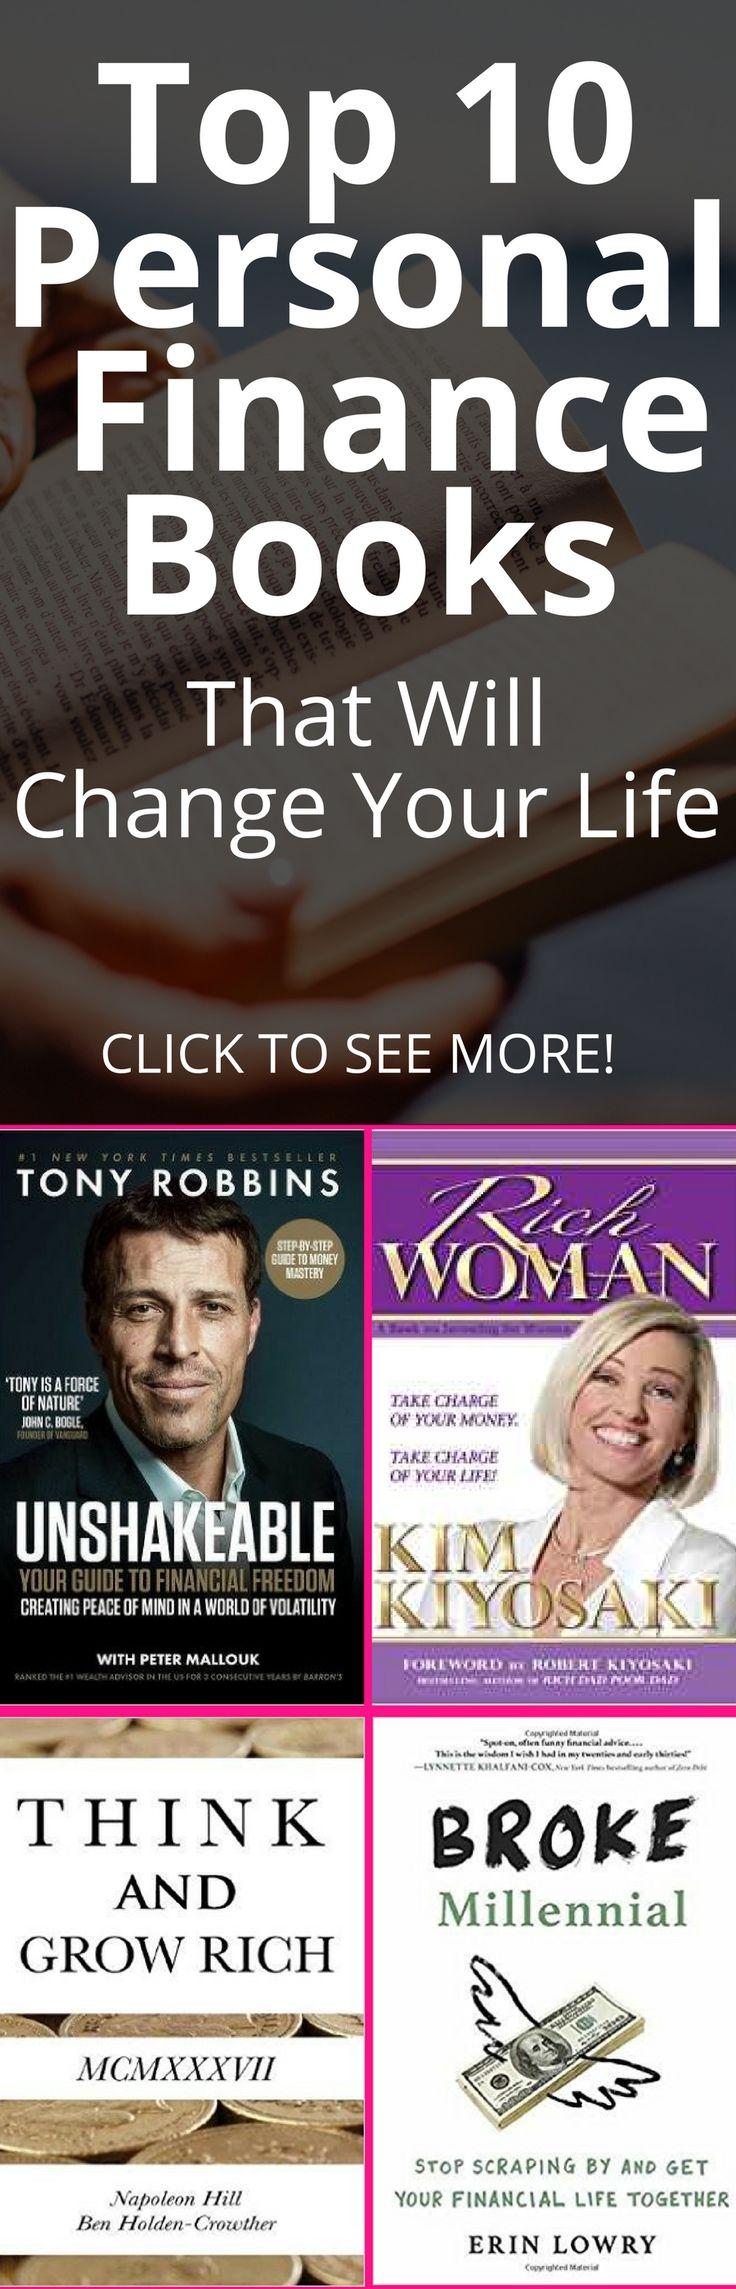 Five Best Personal Finance Books - Lifehacker